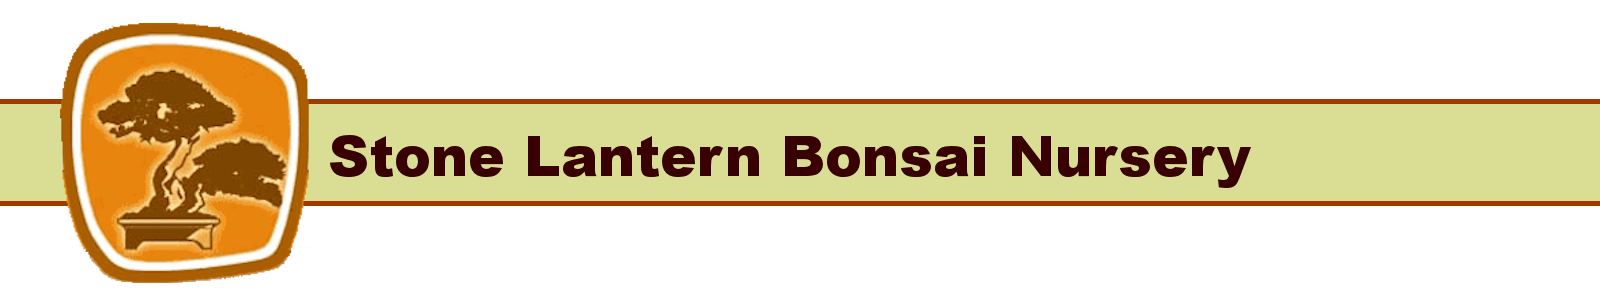 Stone Lantern Bonsai Nursery Logo